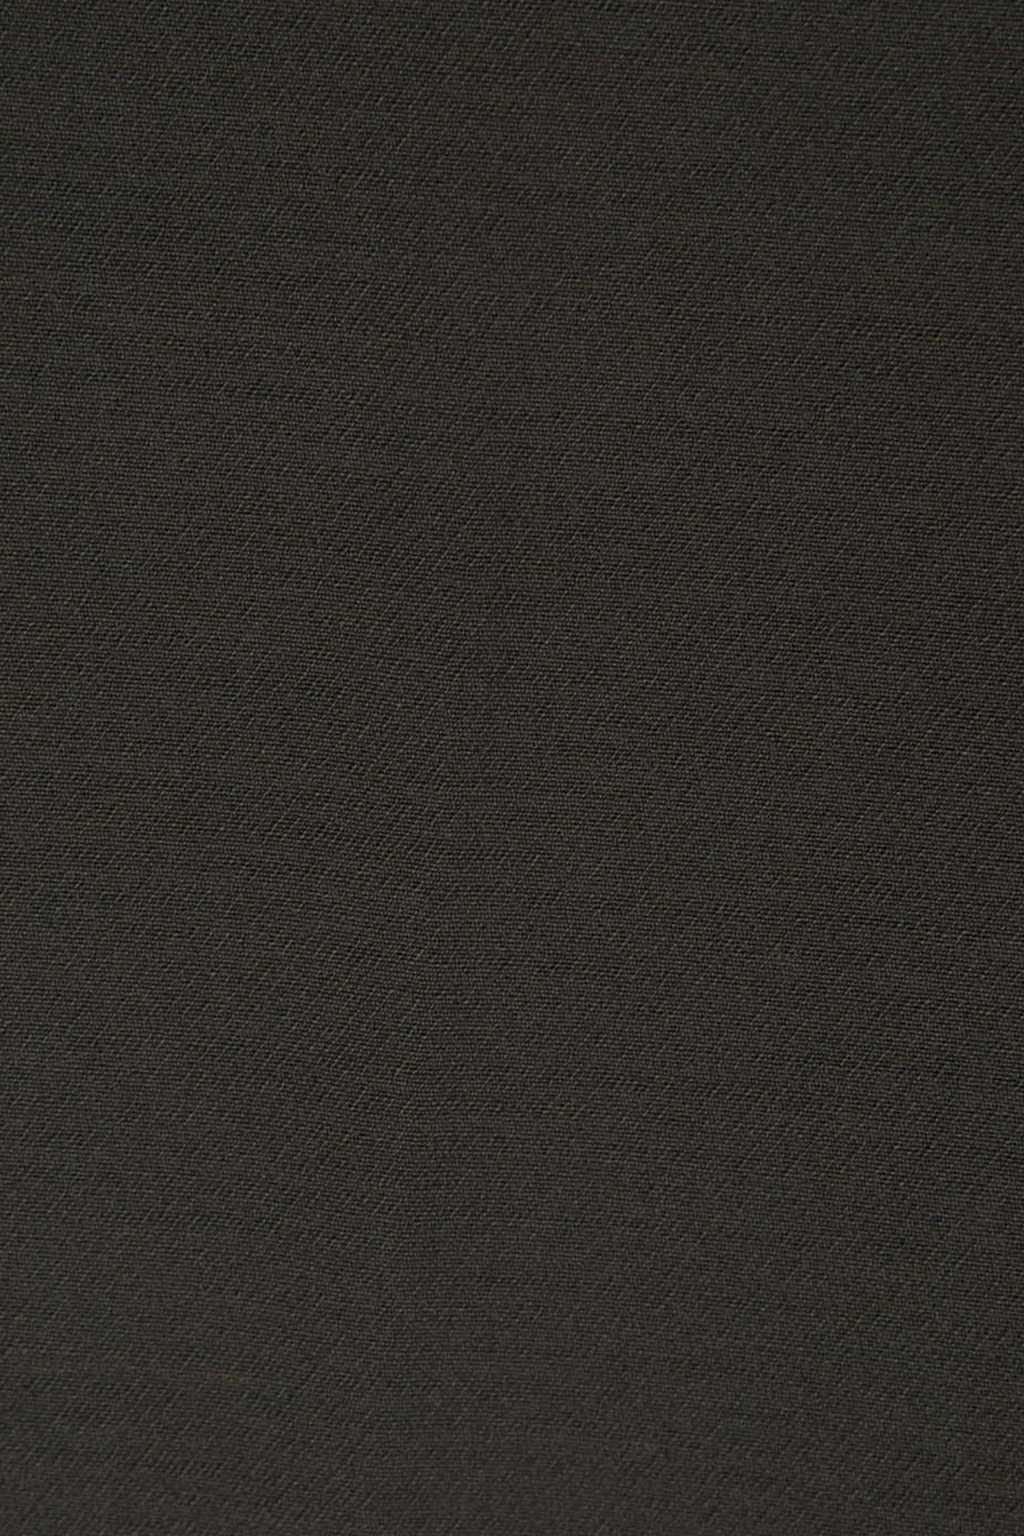 Pant 1455 Olive 6